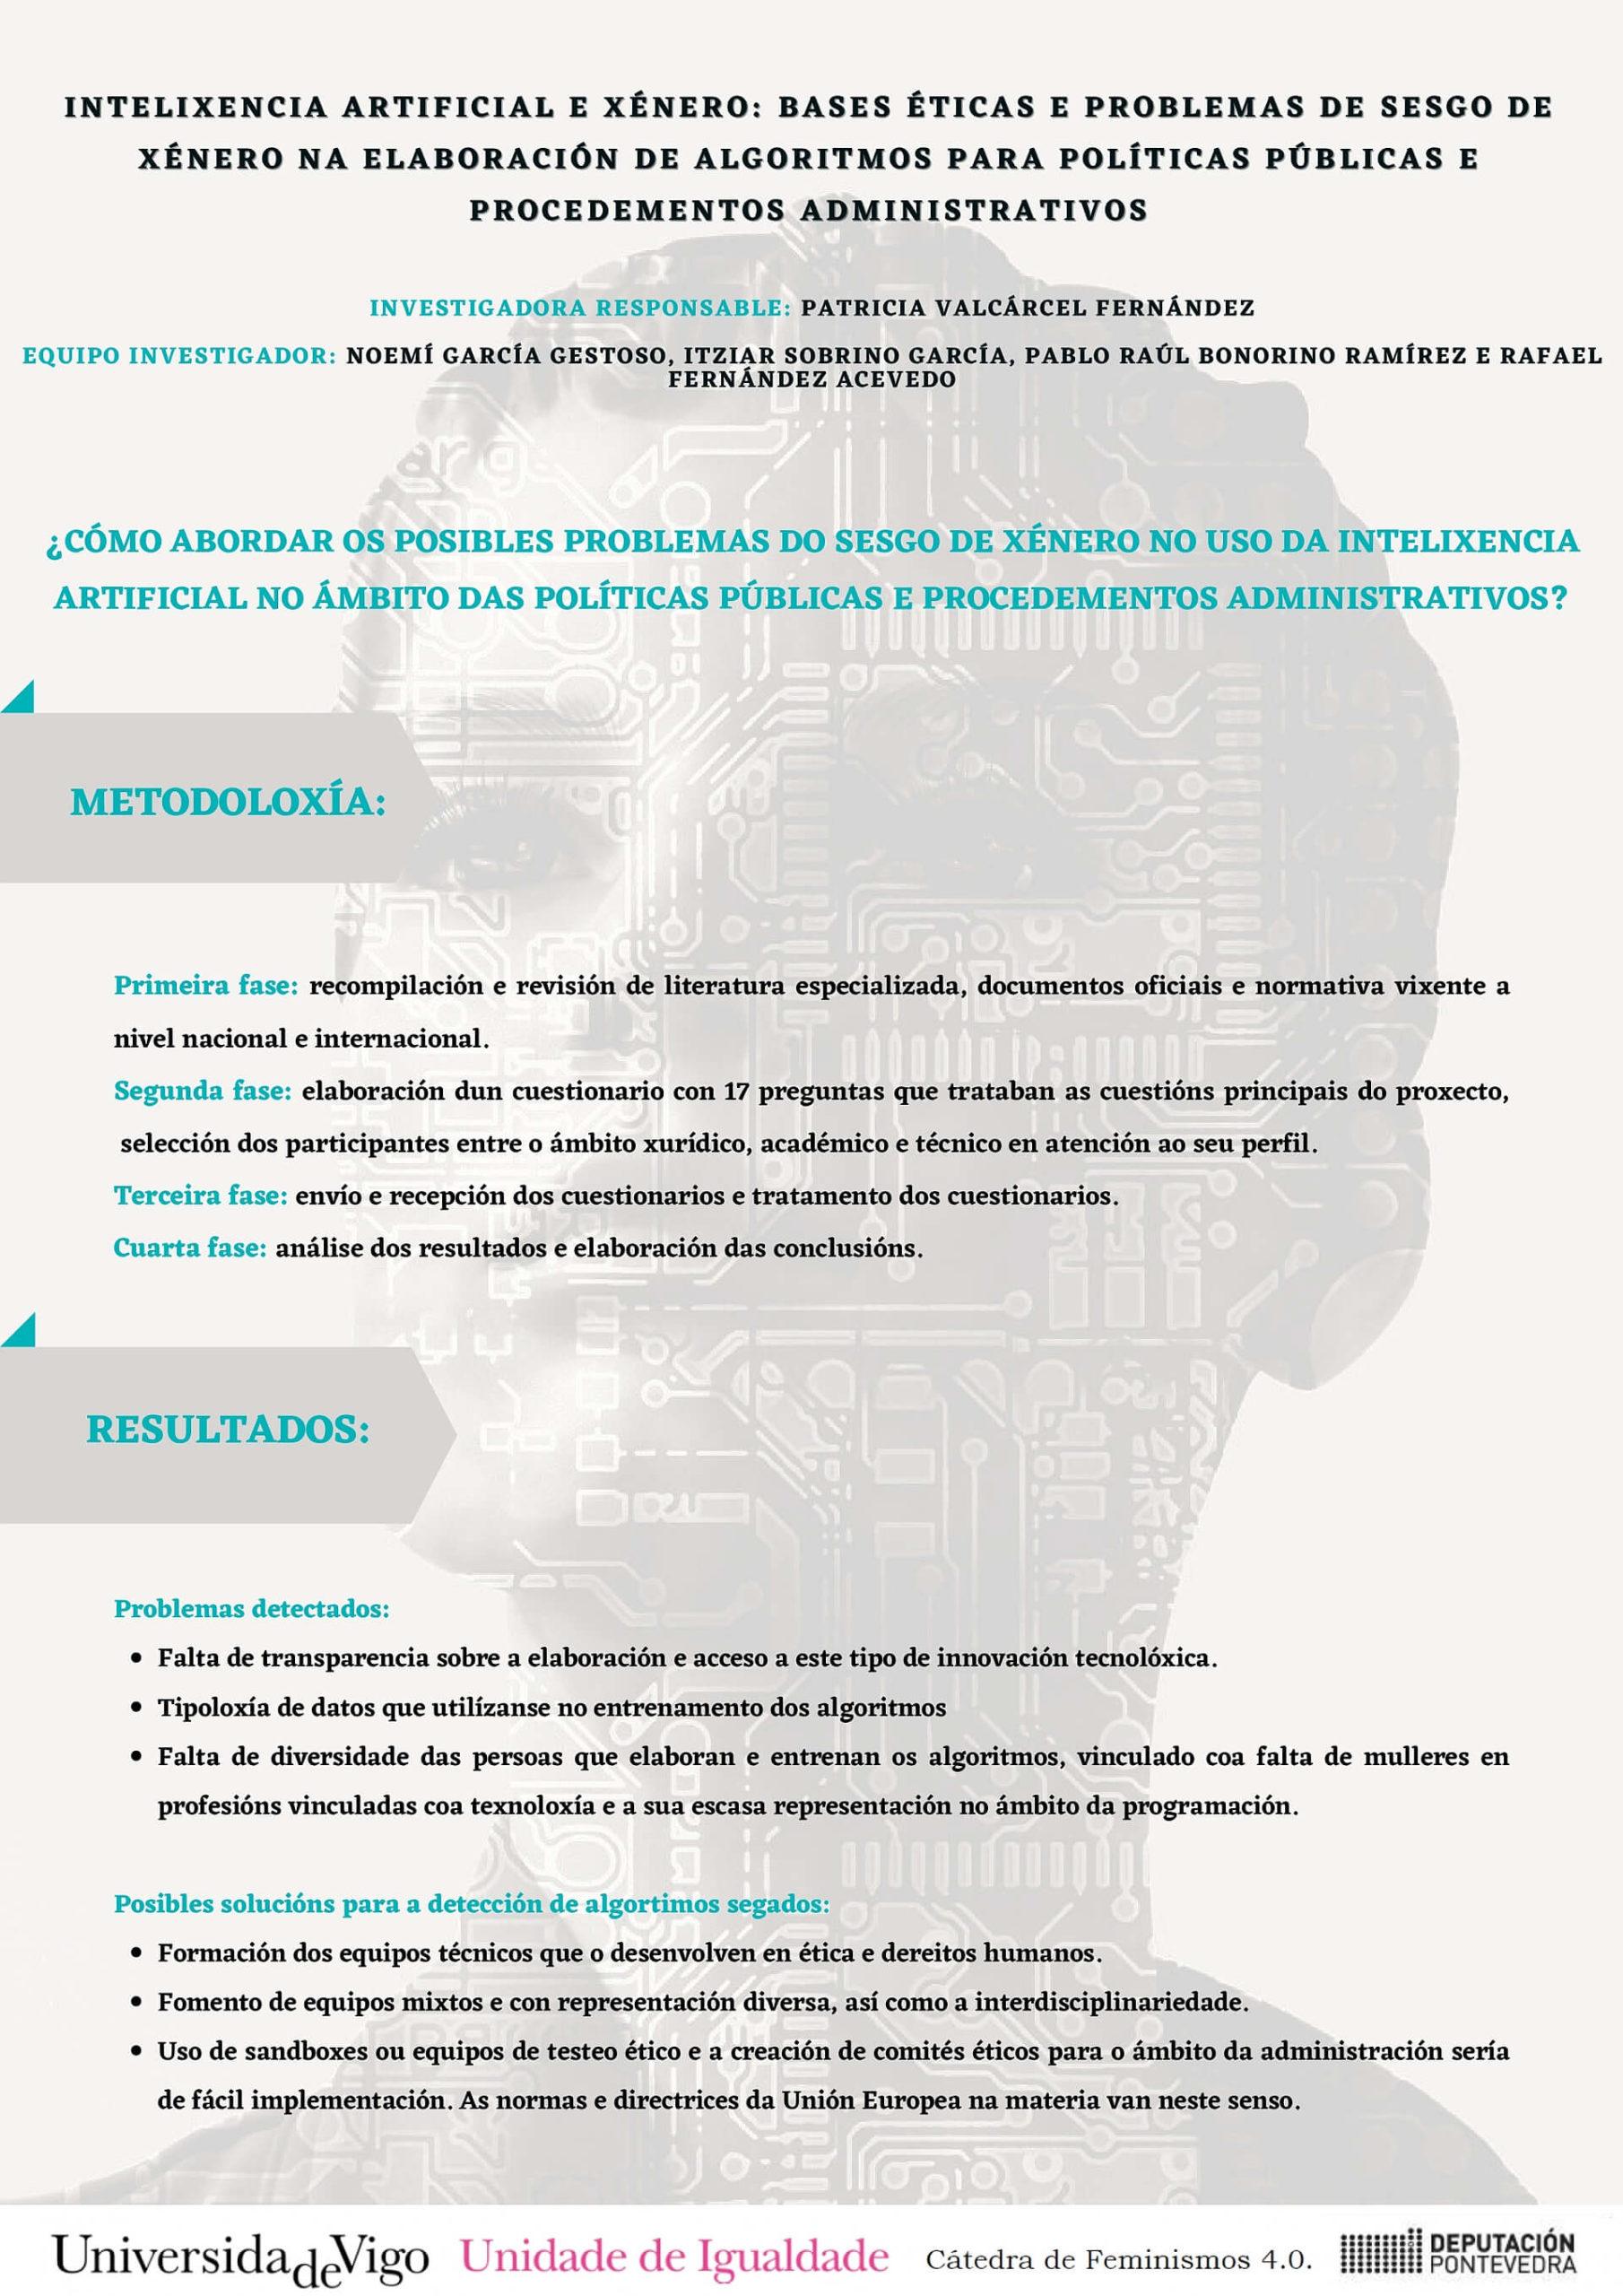 Cartel Intelixencia artificial e xenero-Patricia Valcarcel Catedra 2020